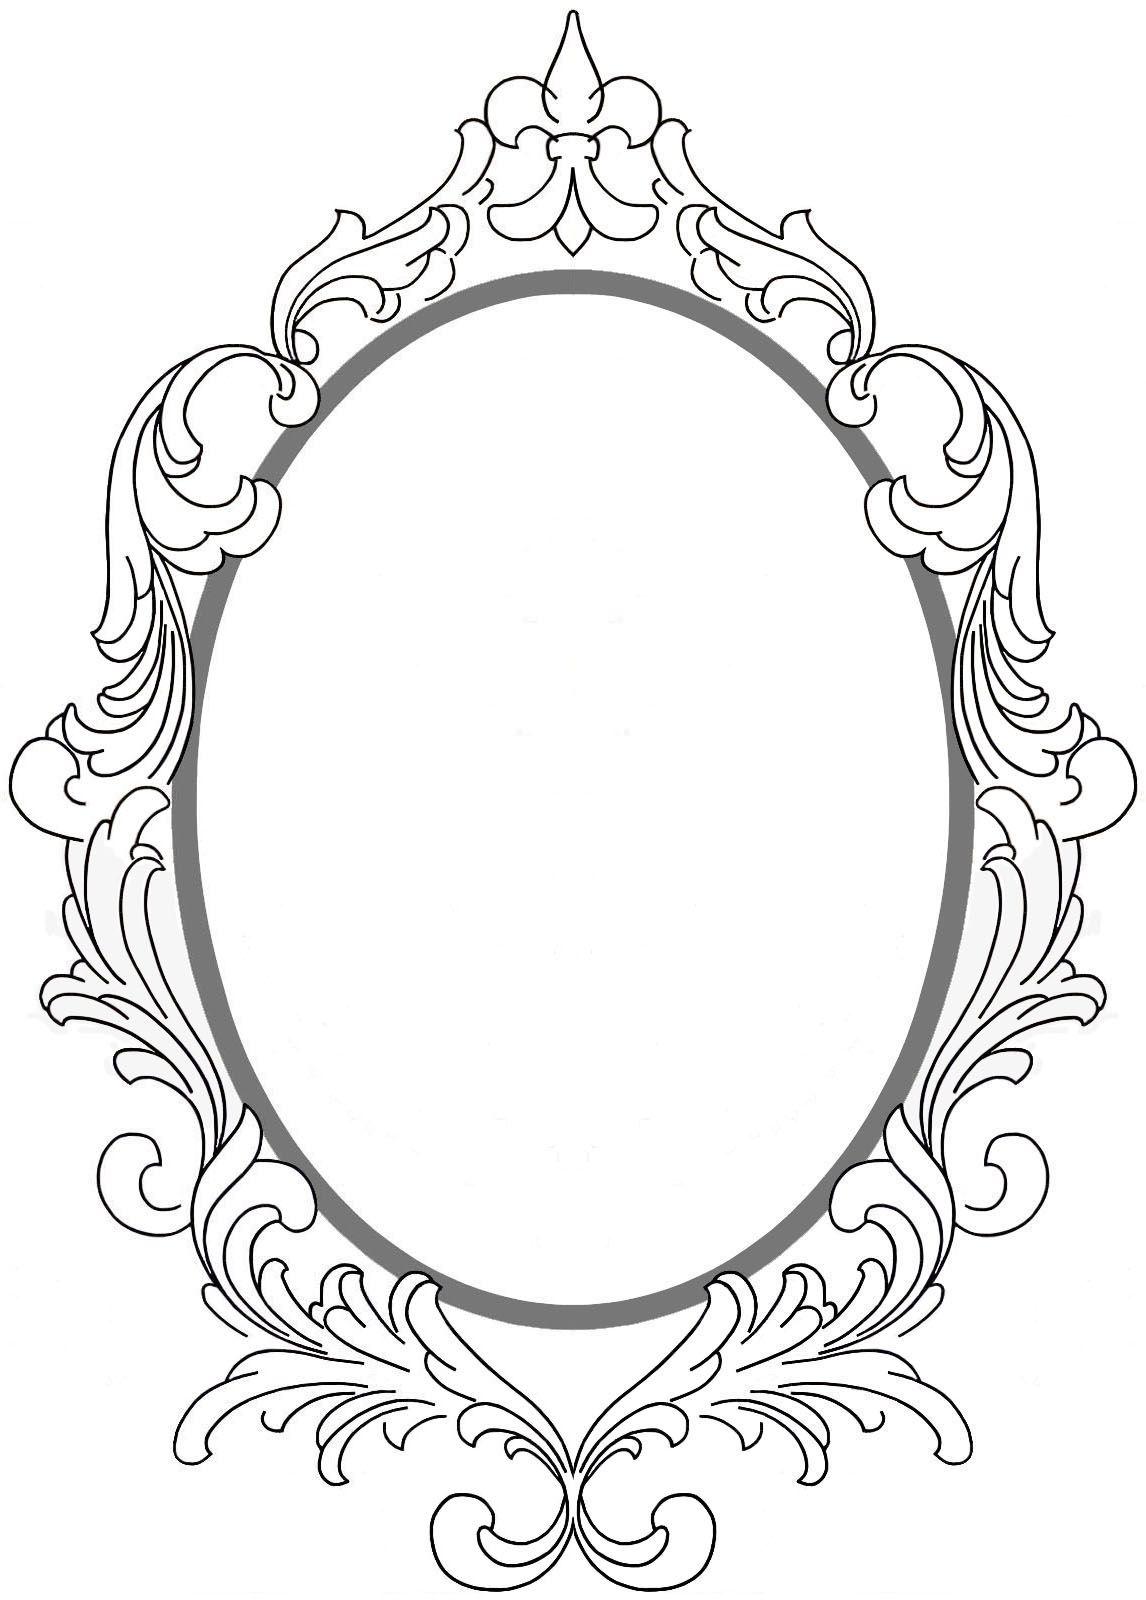 Rahmen Vintage Frame Tattoo Framed Tattoo Mirror Tattoos